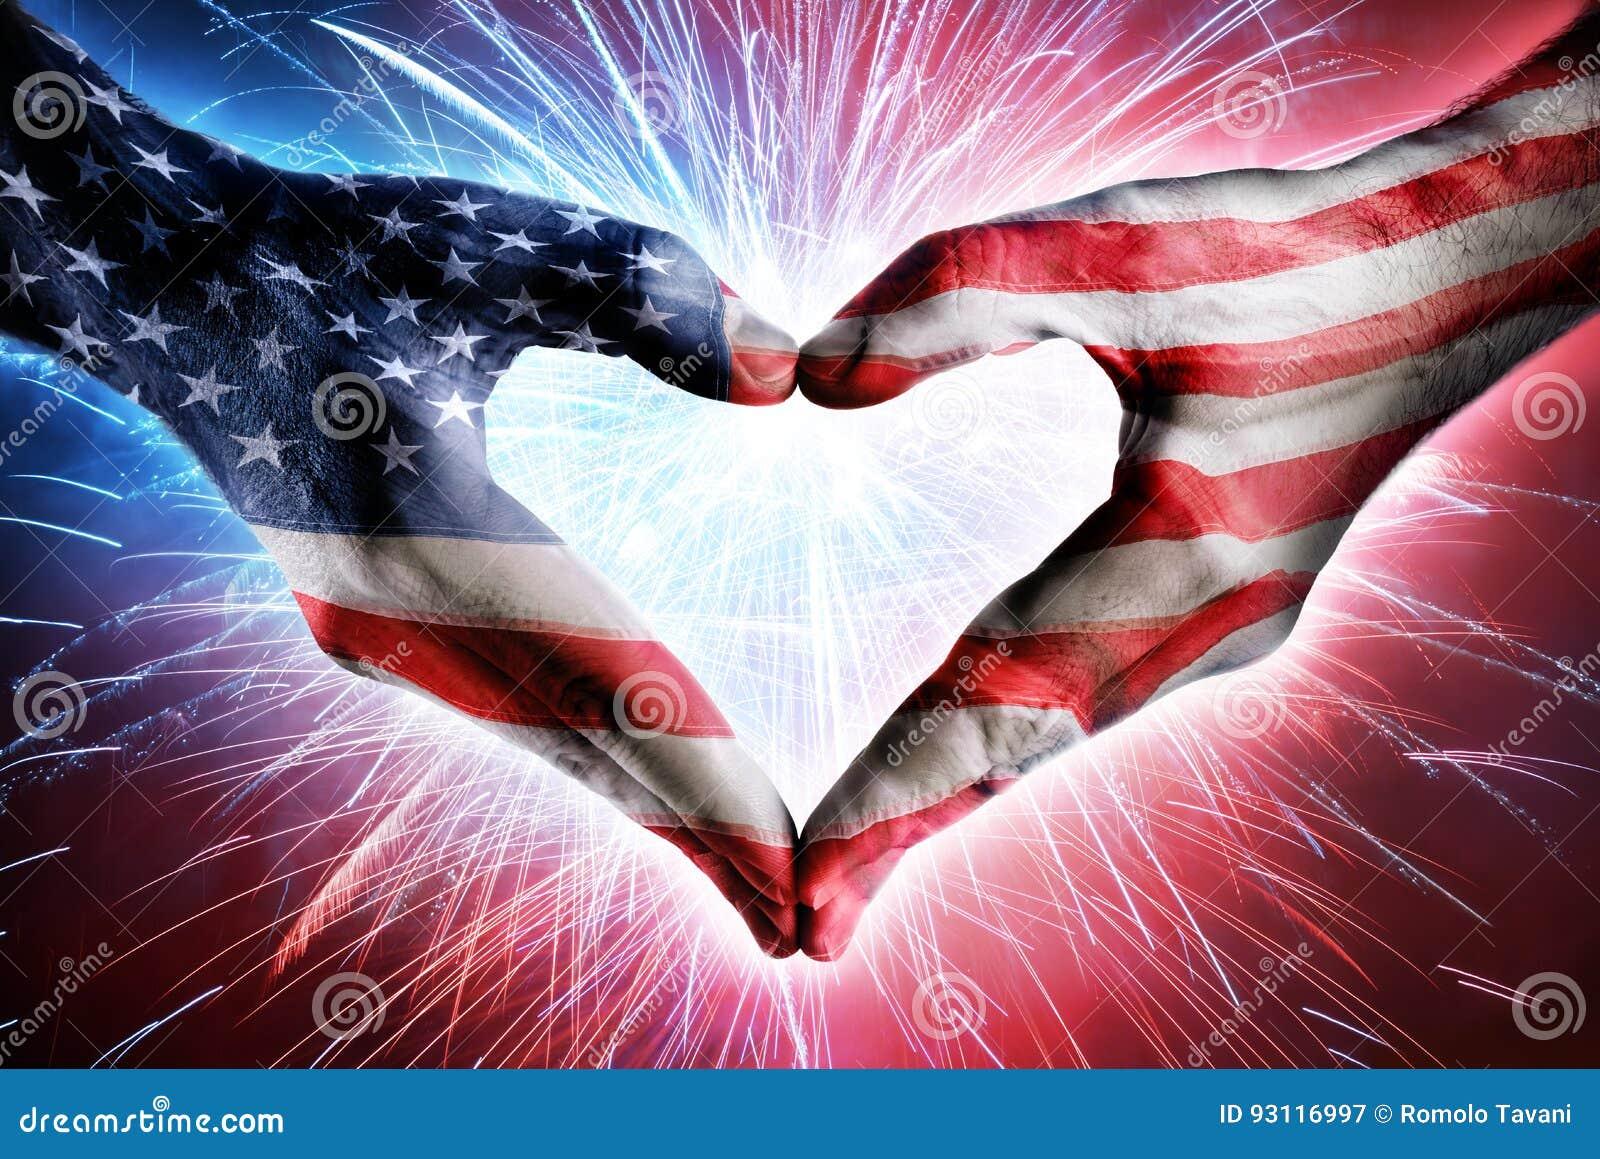 love and patriotism